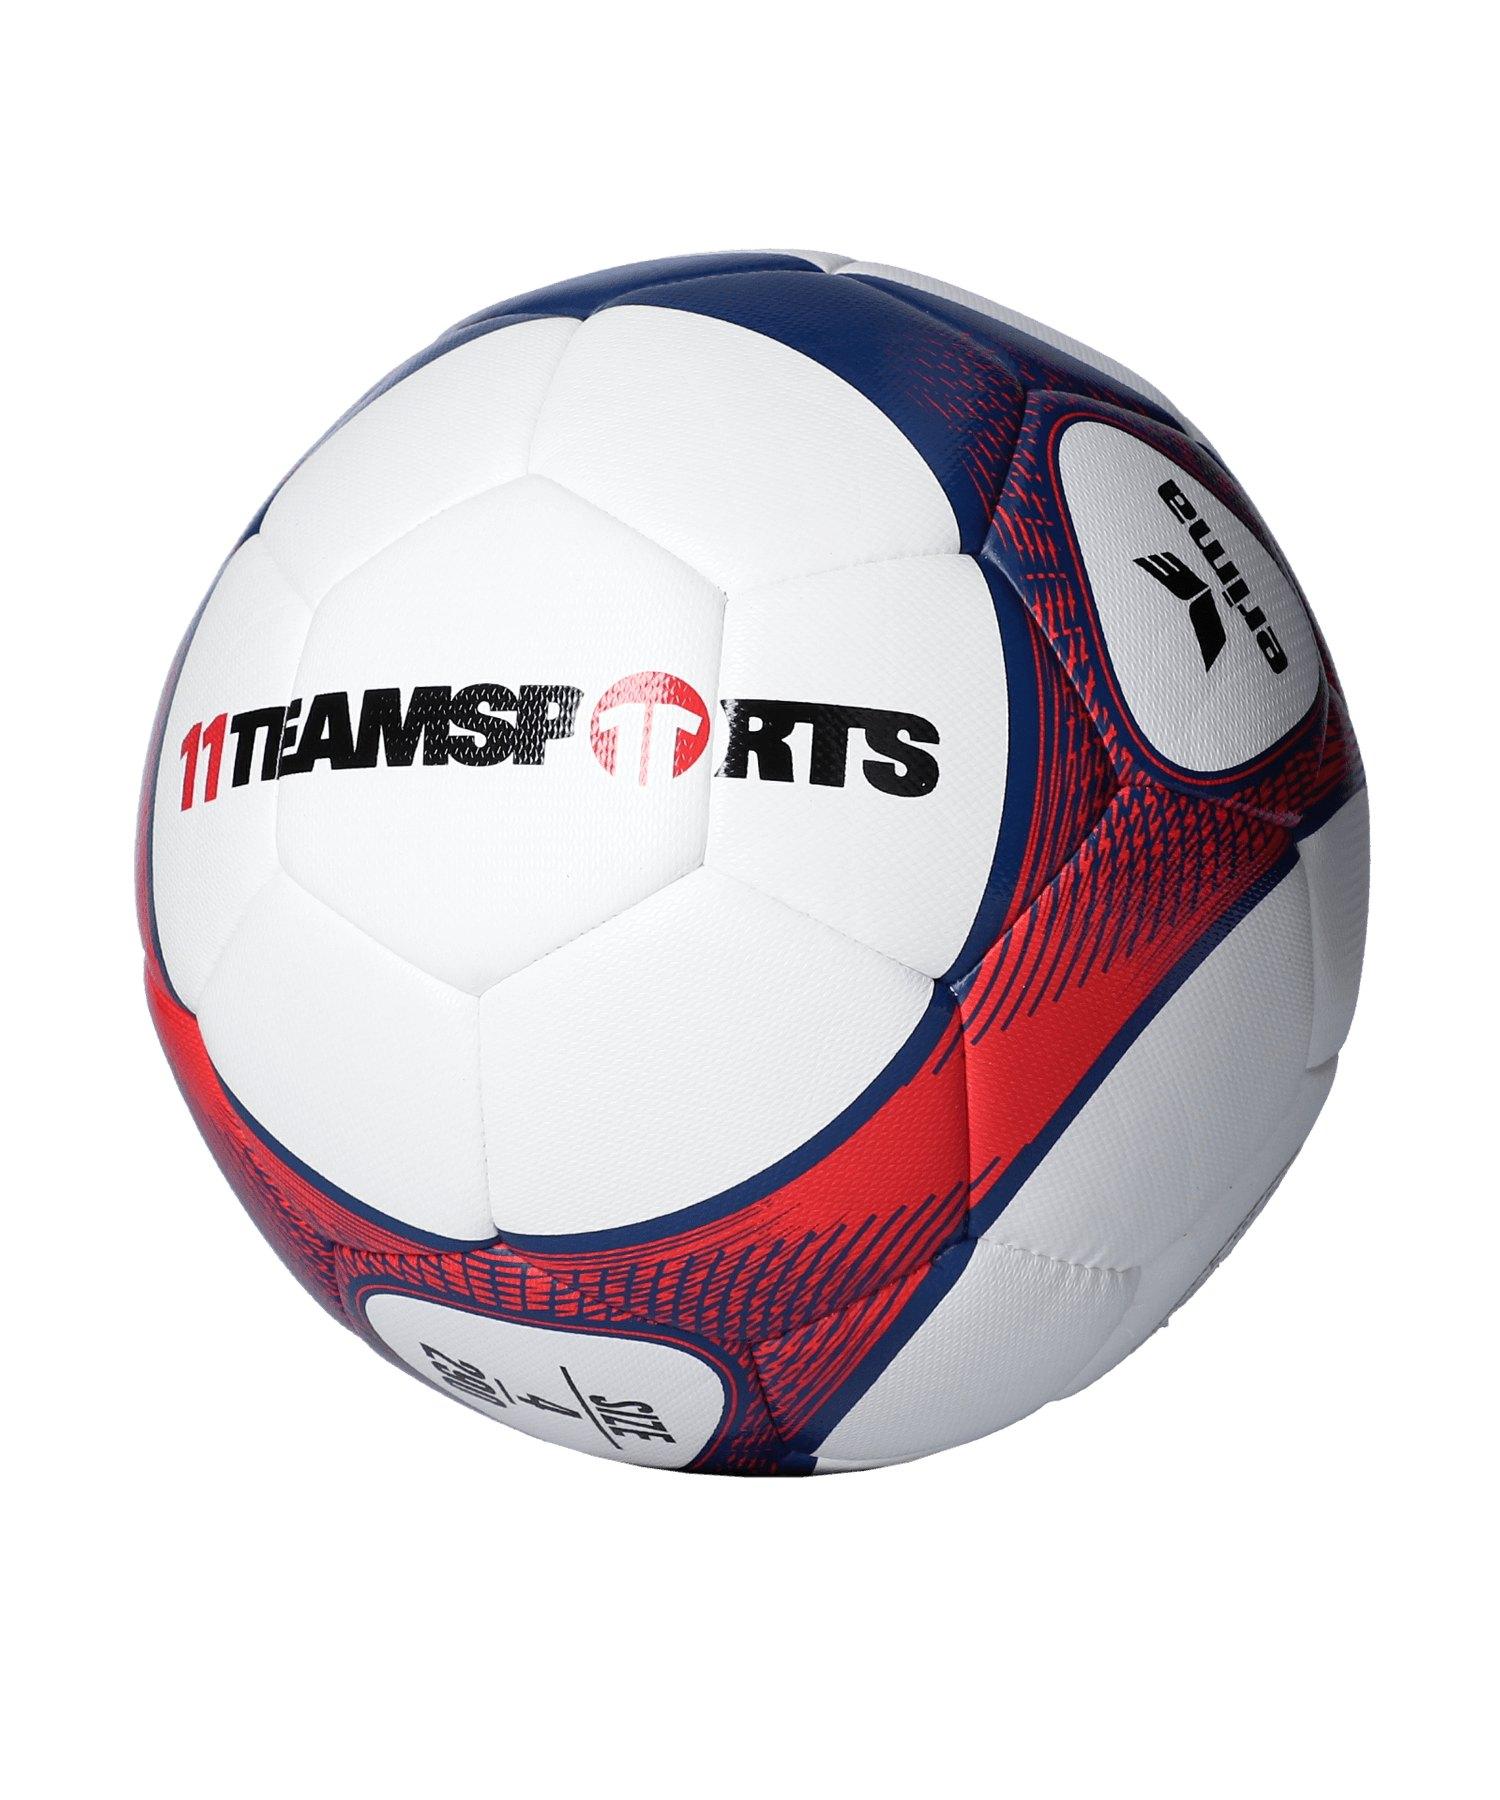 Erima Hybrid Lite 290 Trainingsball Rot Blau - rot